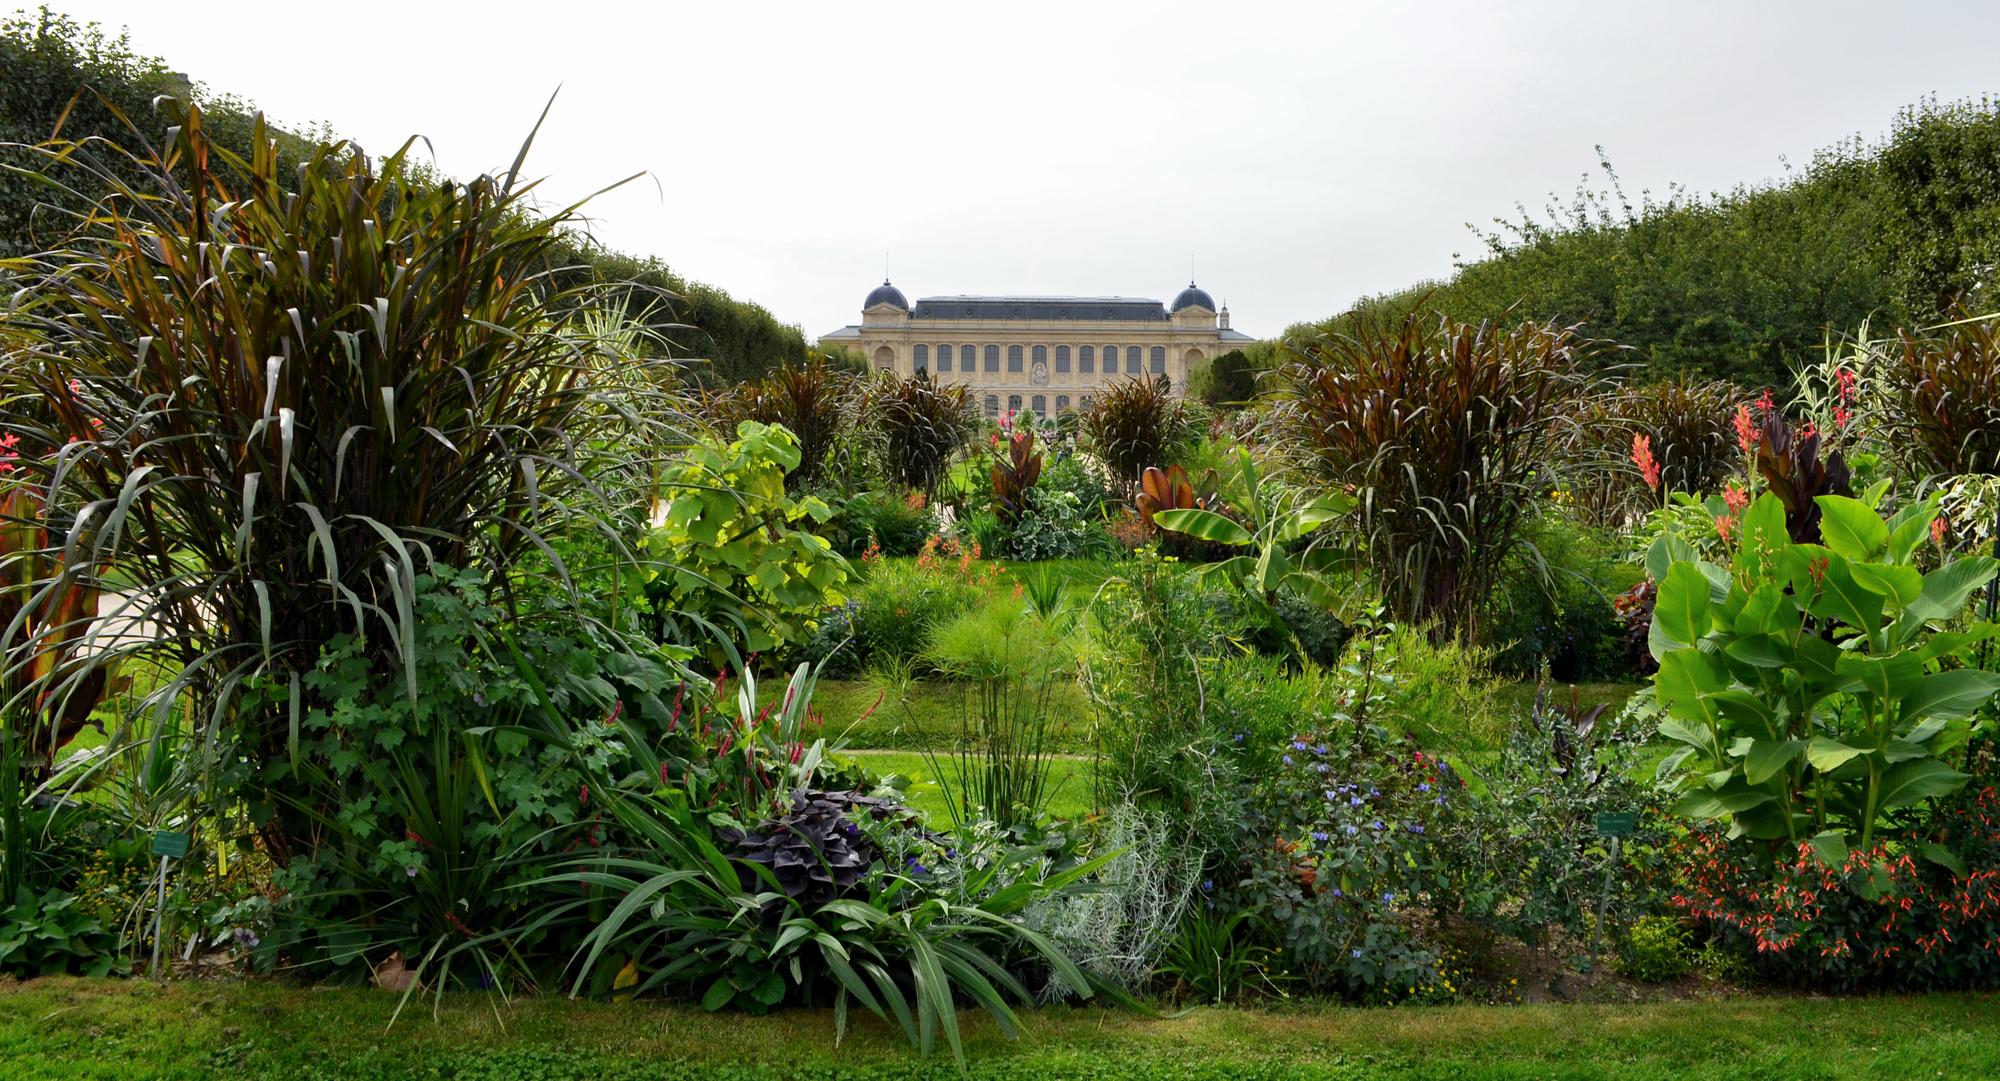 Jardin Des Plantes | Galeries, Jardins, Zoo - Jardin Des Plantes pour Créer Un Plan De Jardin Gratuit